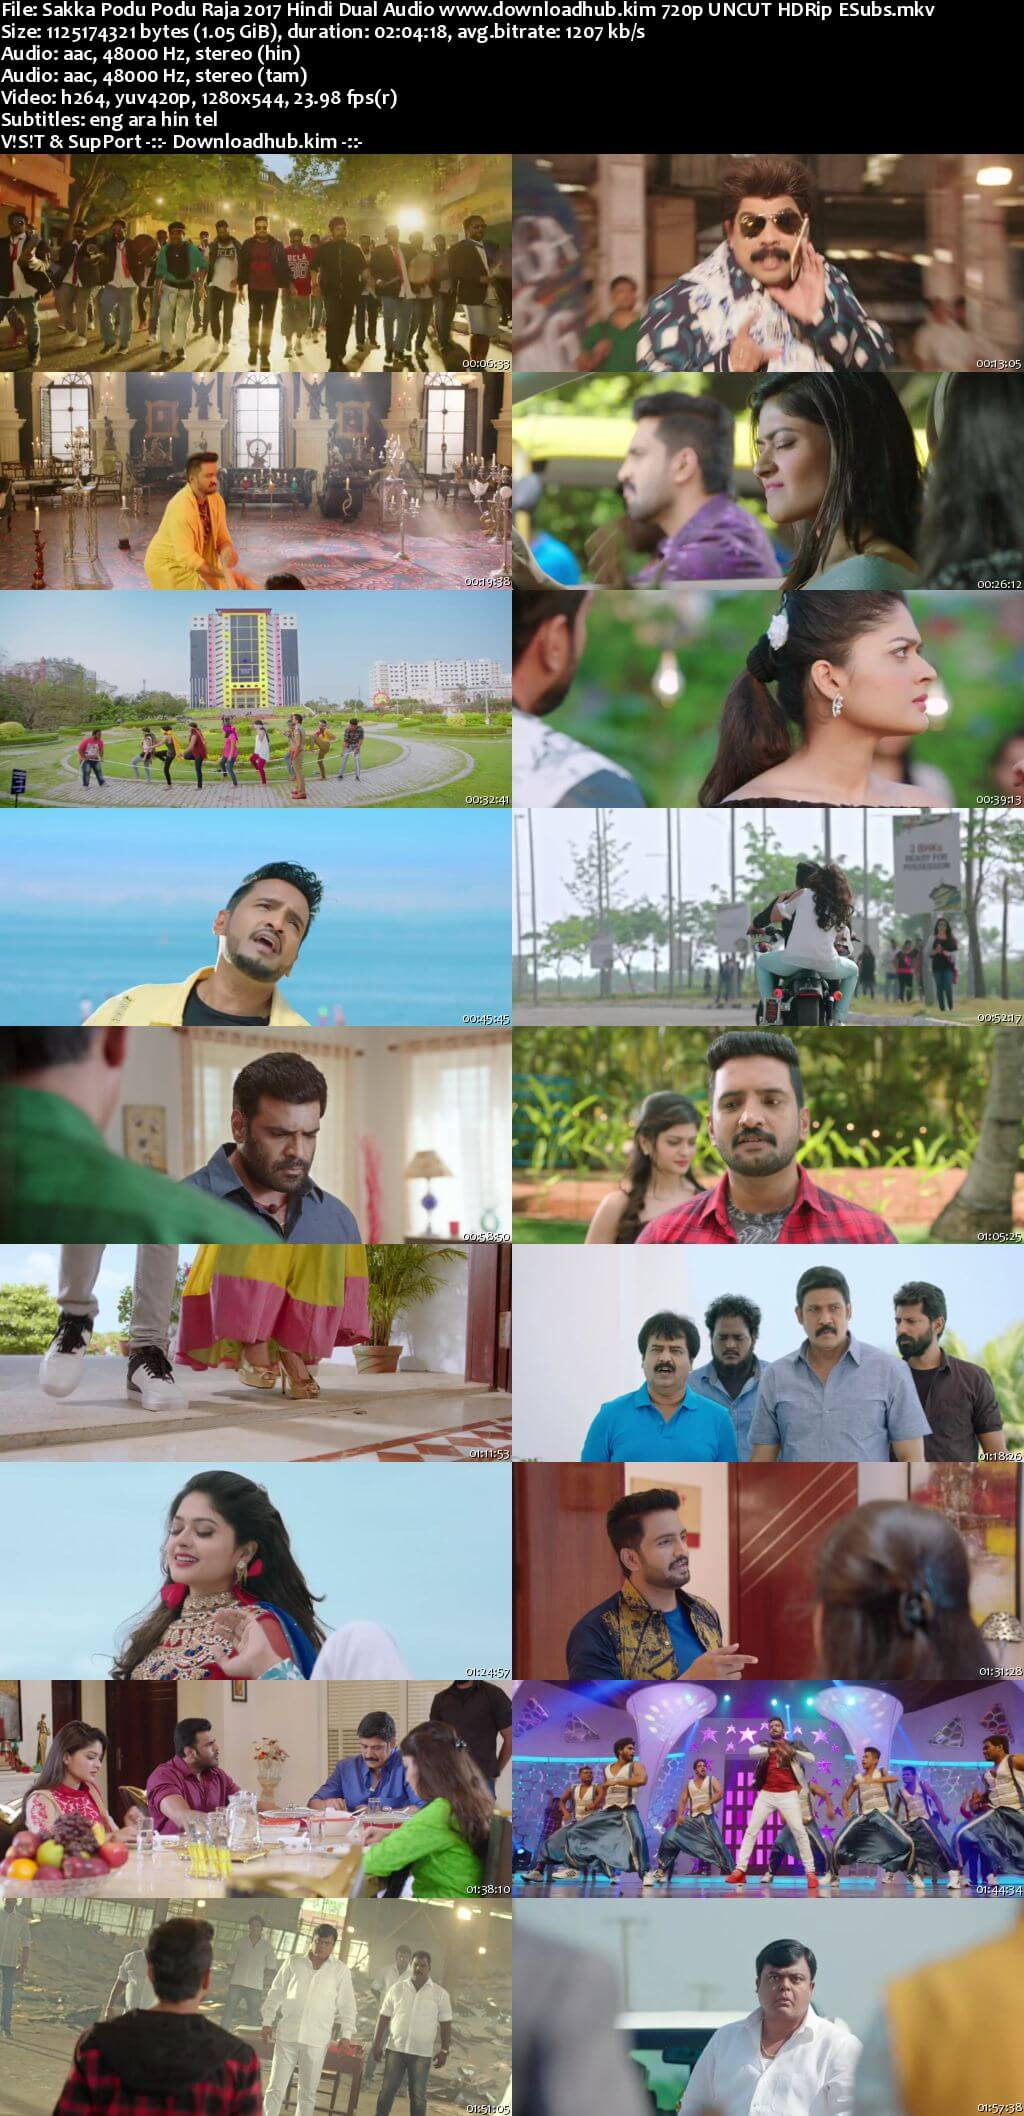 Sakka Podu Podu Raja 2017 Hindi Dual Audio 720p UNCUT HDRip ESubs